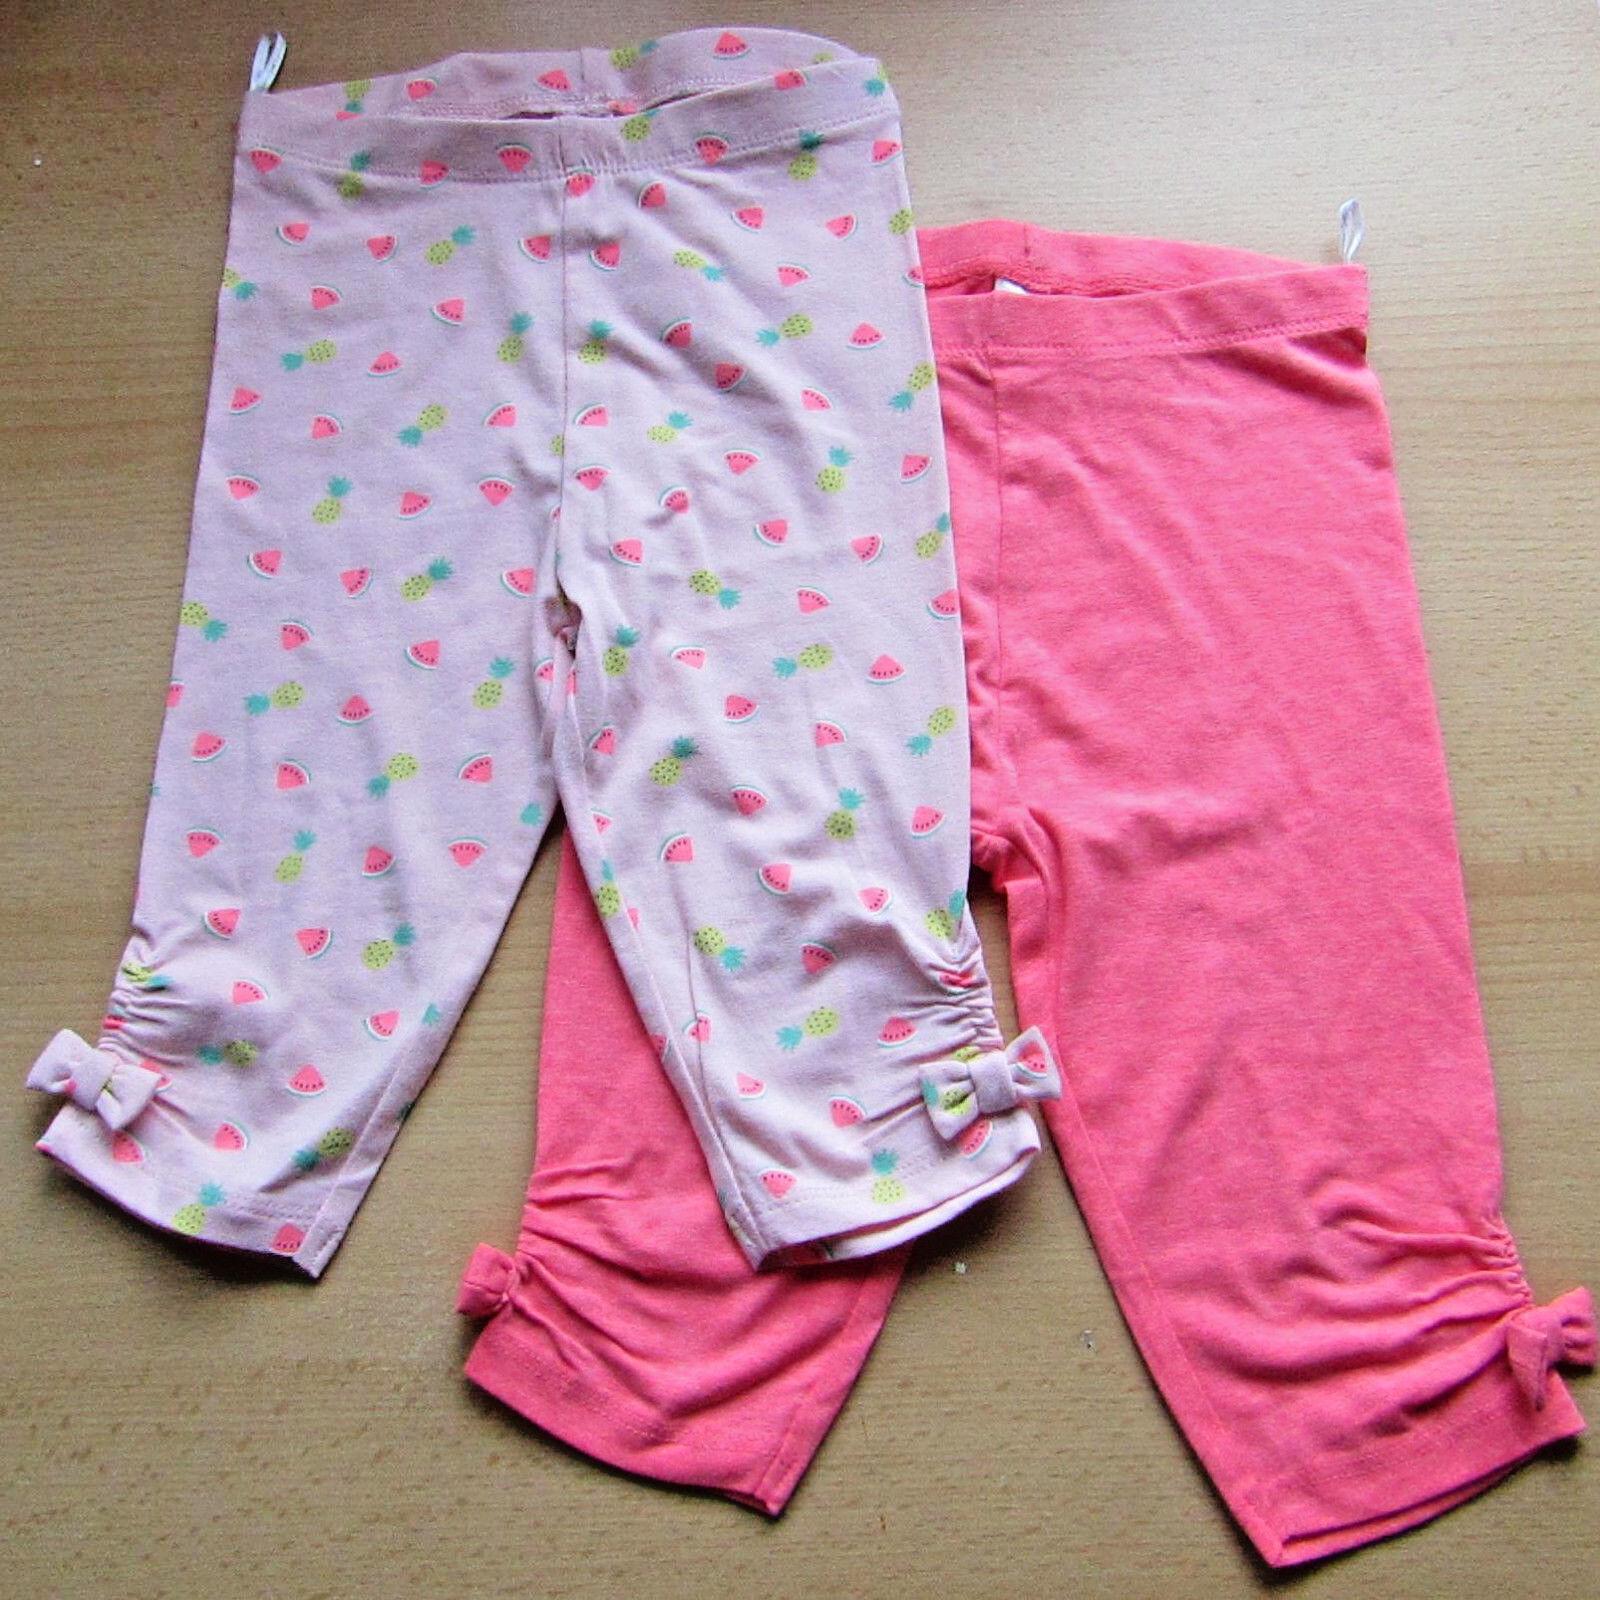 Baby Mädchen Caprileggings Leggings 2 Stück rosa  NEU mit Etikett